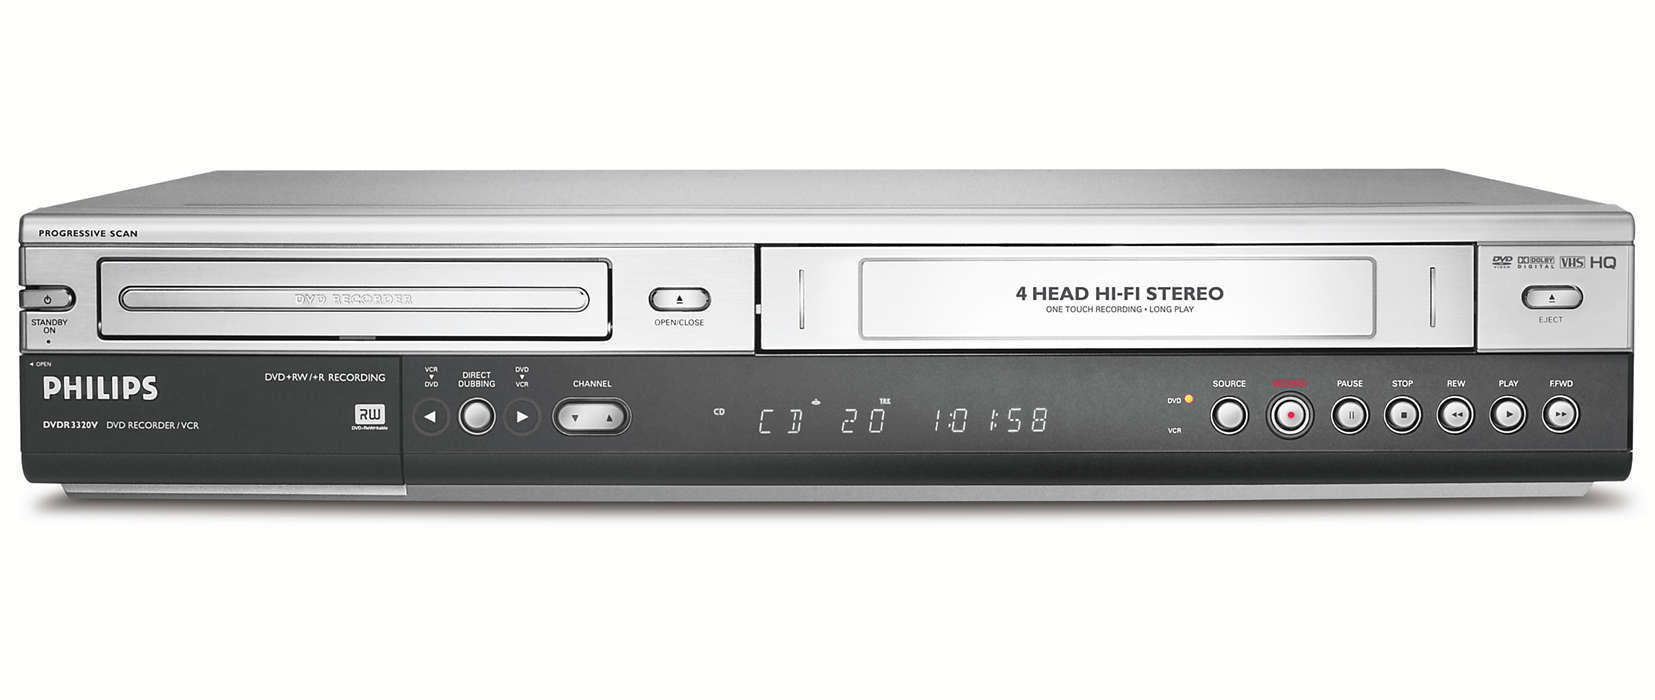 Tallenna VHS-nauhat DVD:lle